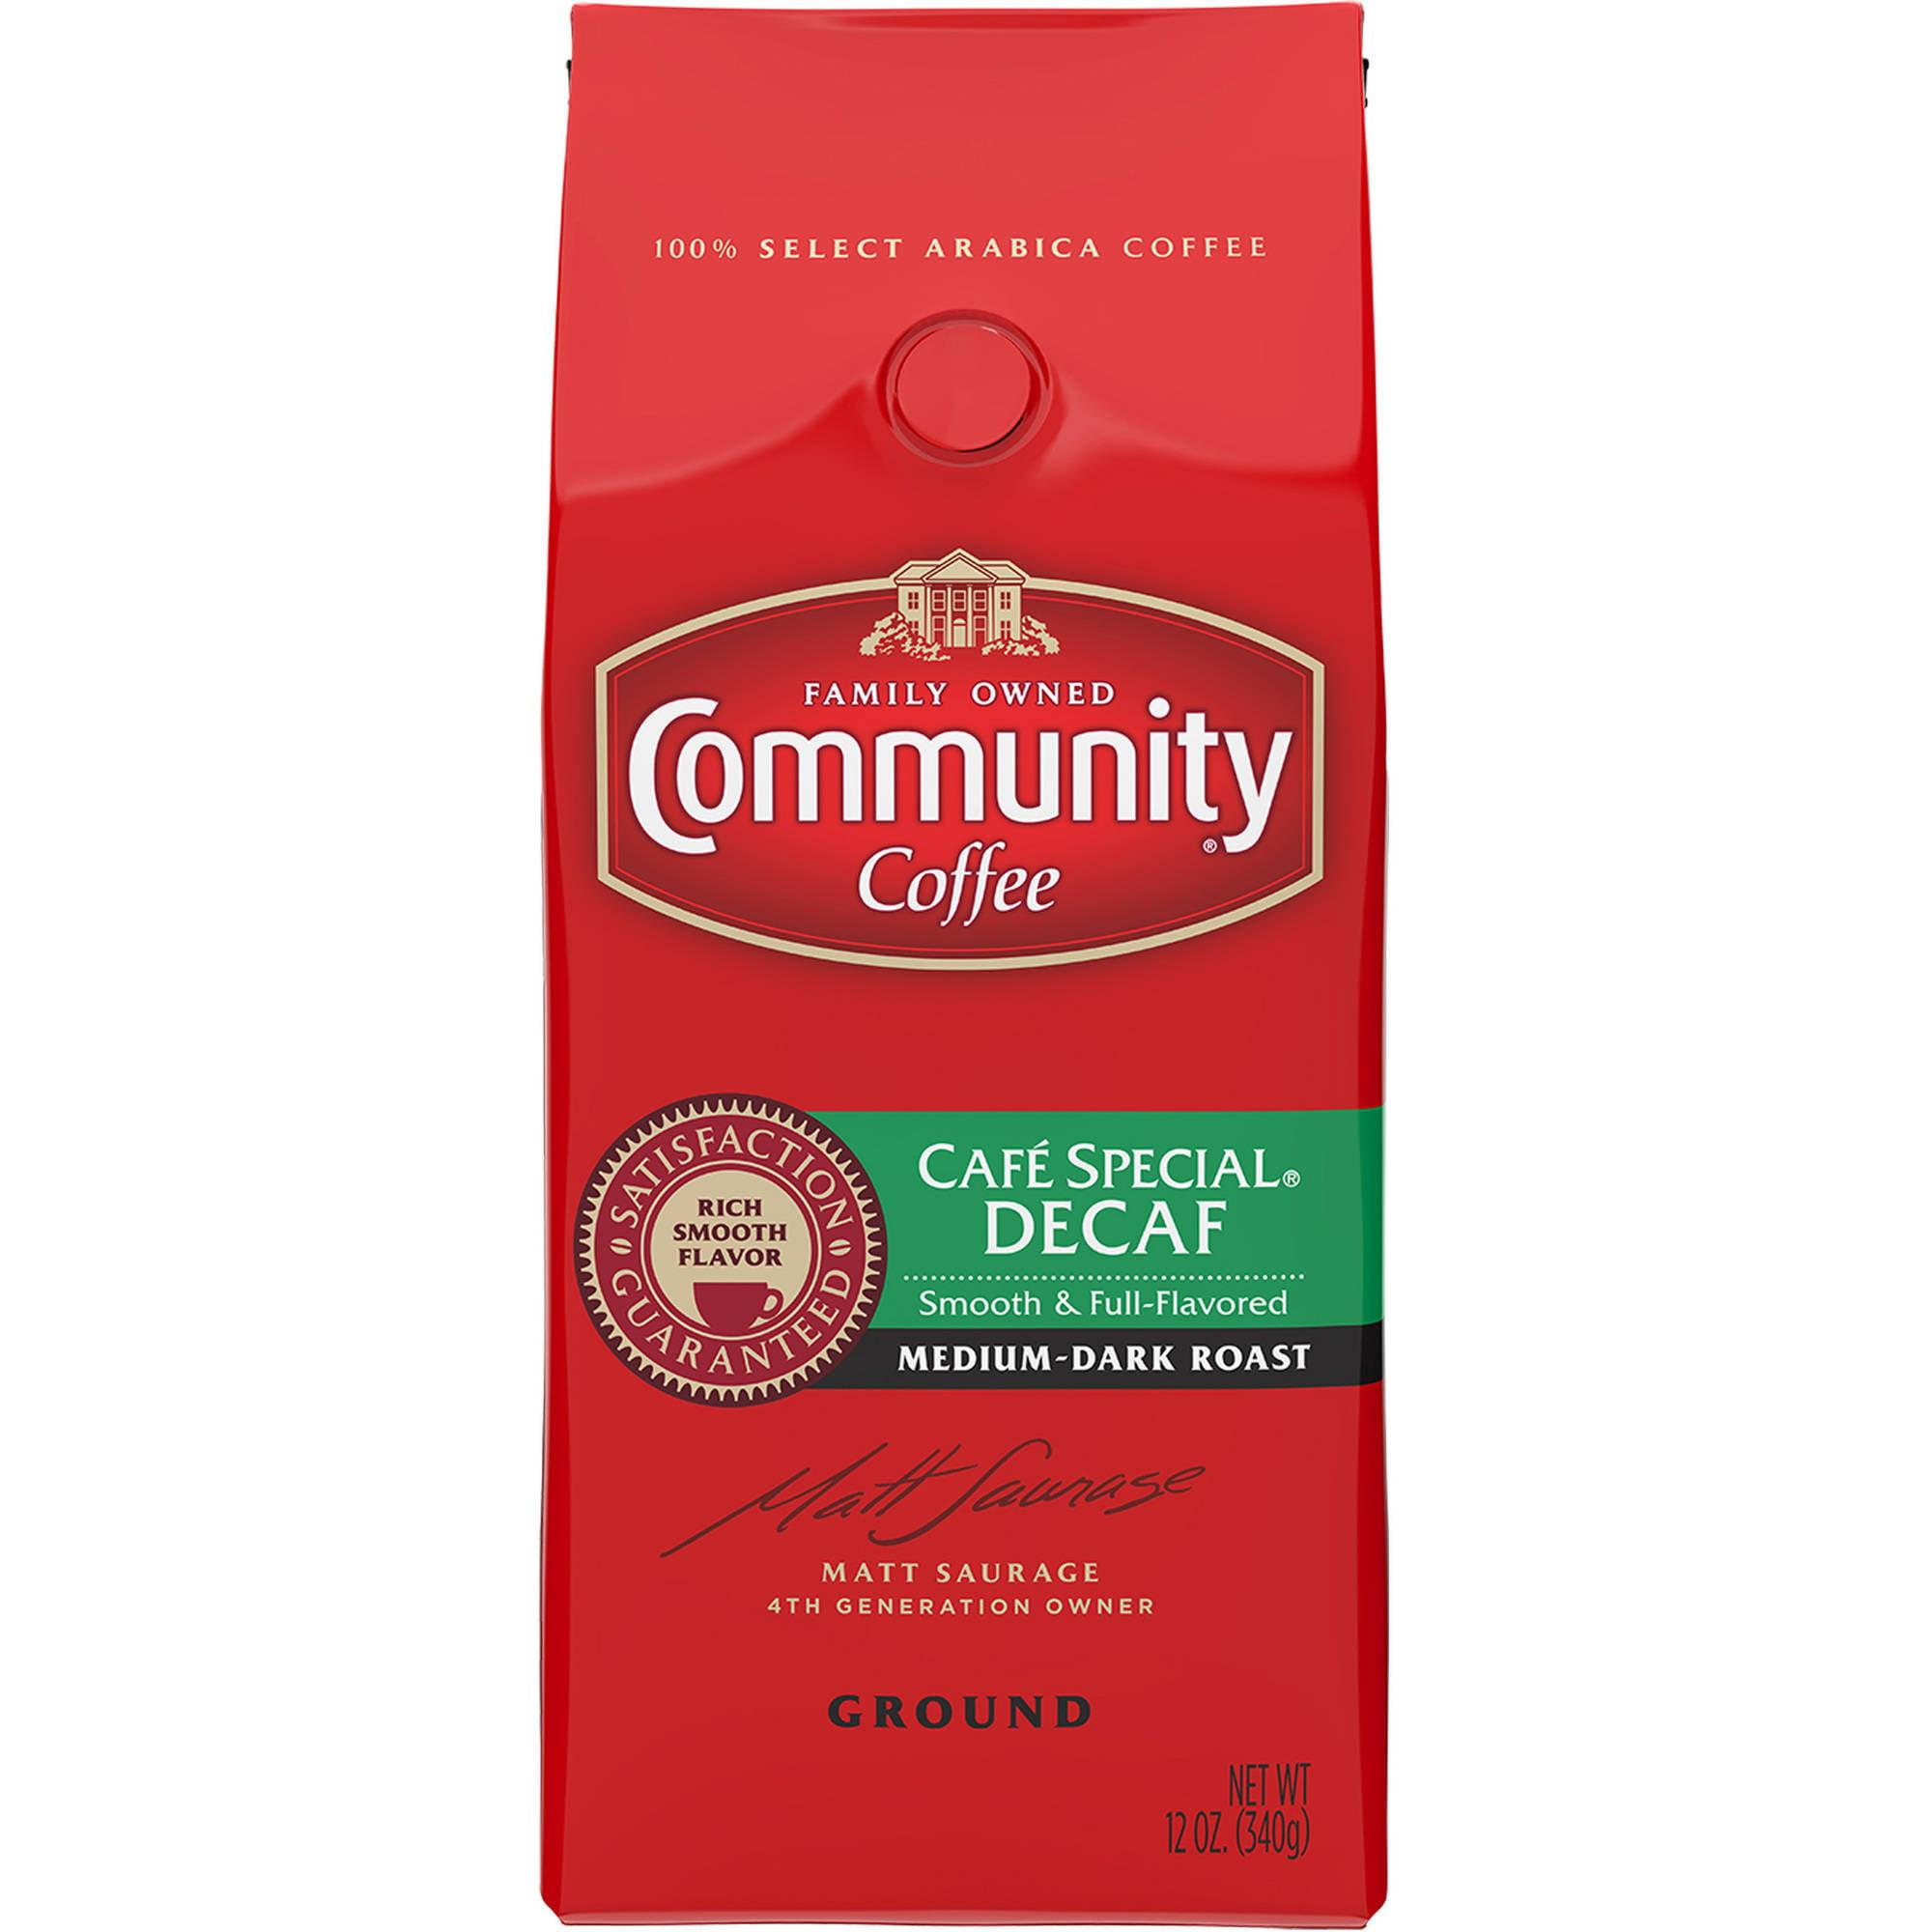 delight caramel macchiato iced coffee drink 5 gal carton walmartcom